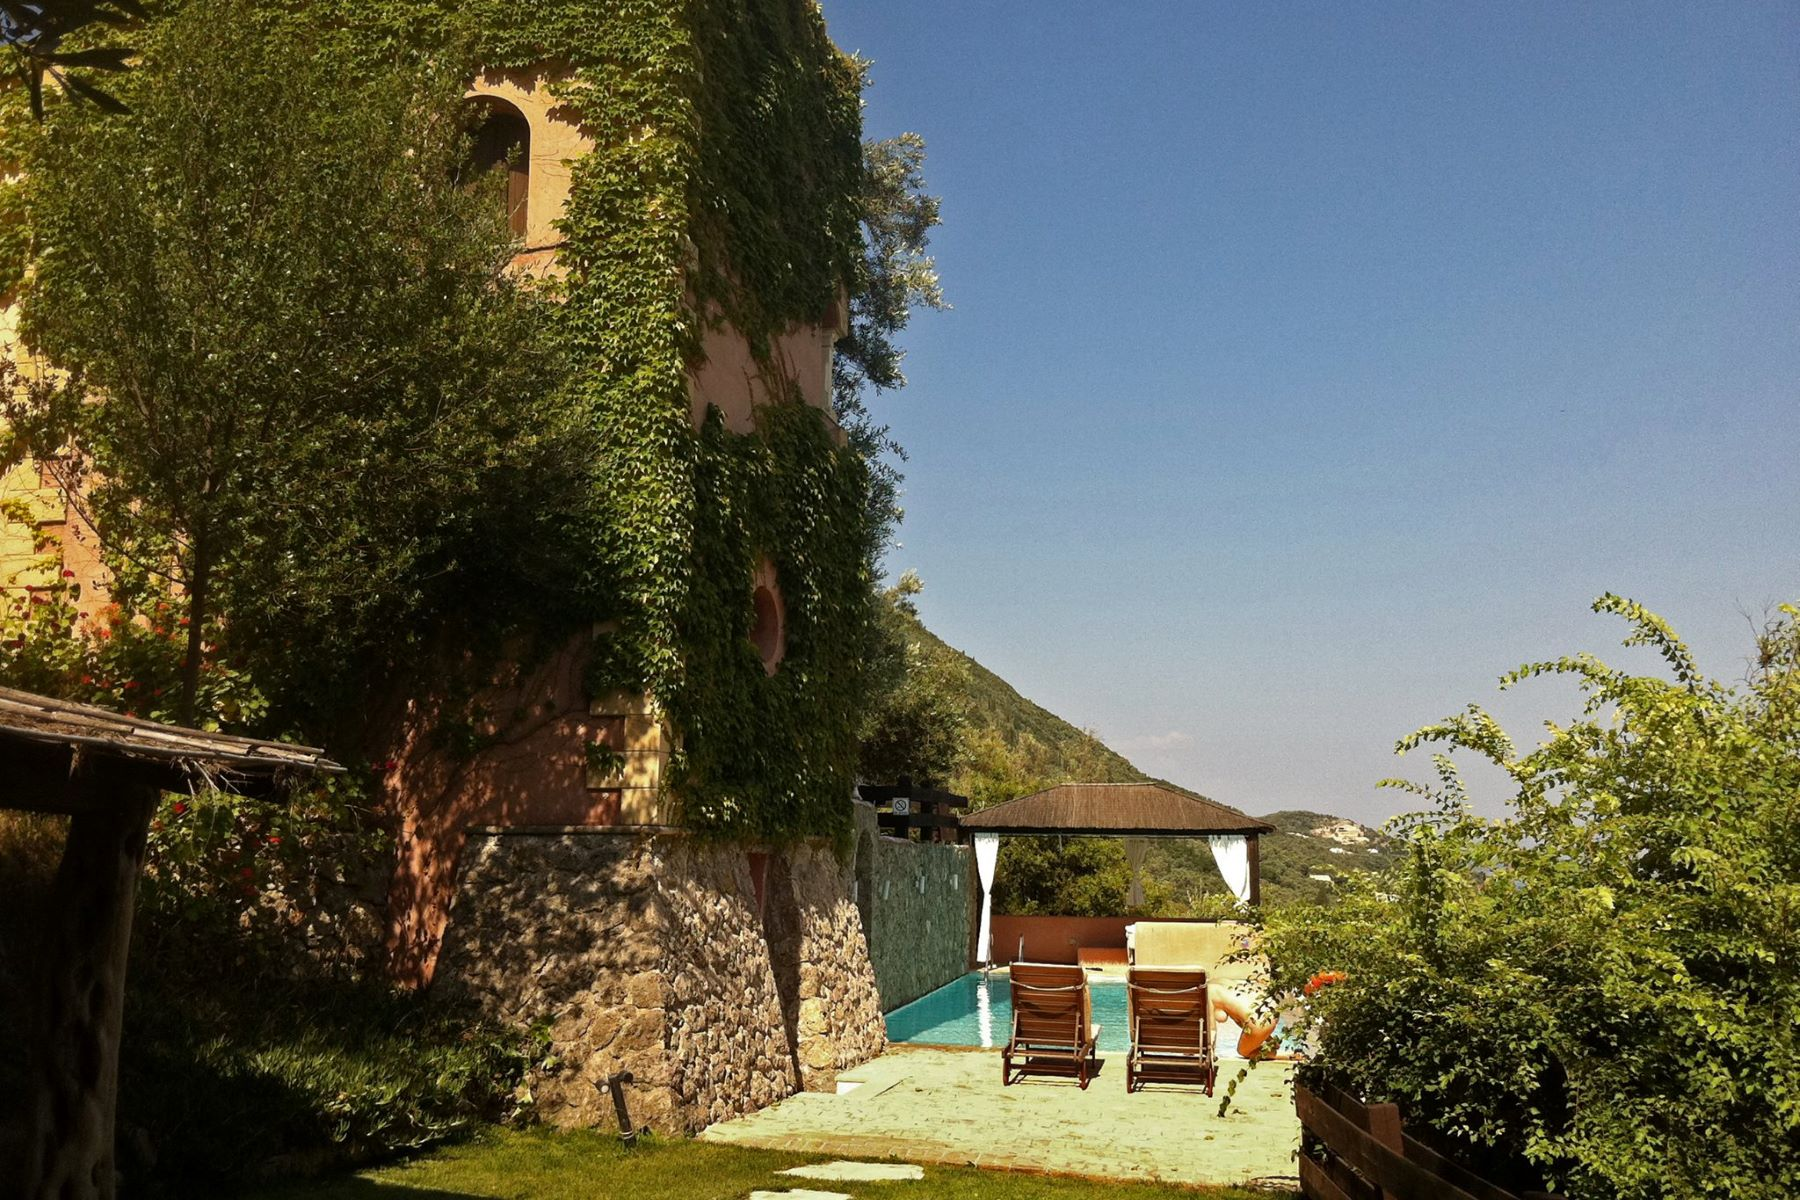 Single Family Home for Sale at Terra Verde Agios Markos Terra Verde Corfu, Ionian Islands, 49083 Greece